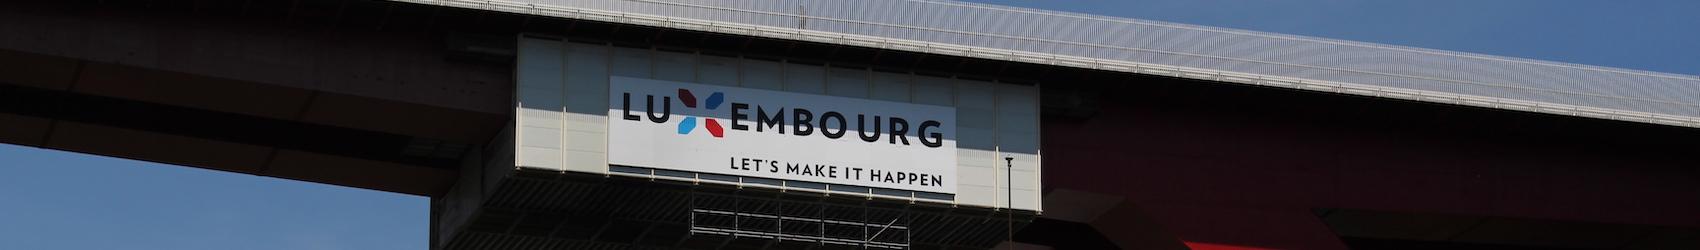 Luxemburg, Rote Brücke